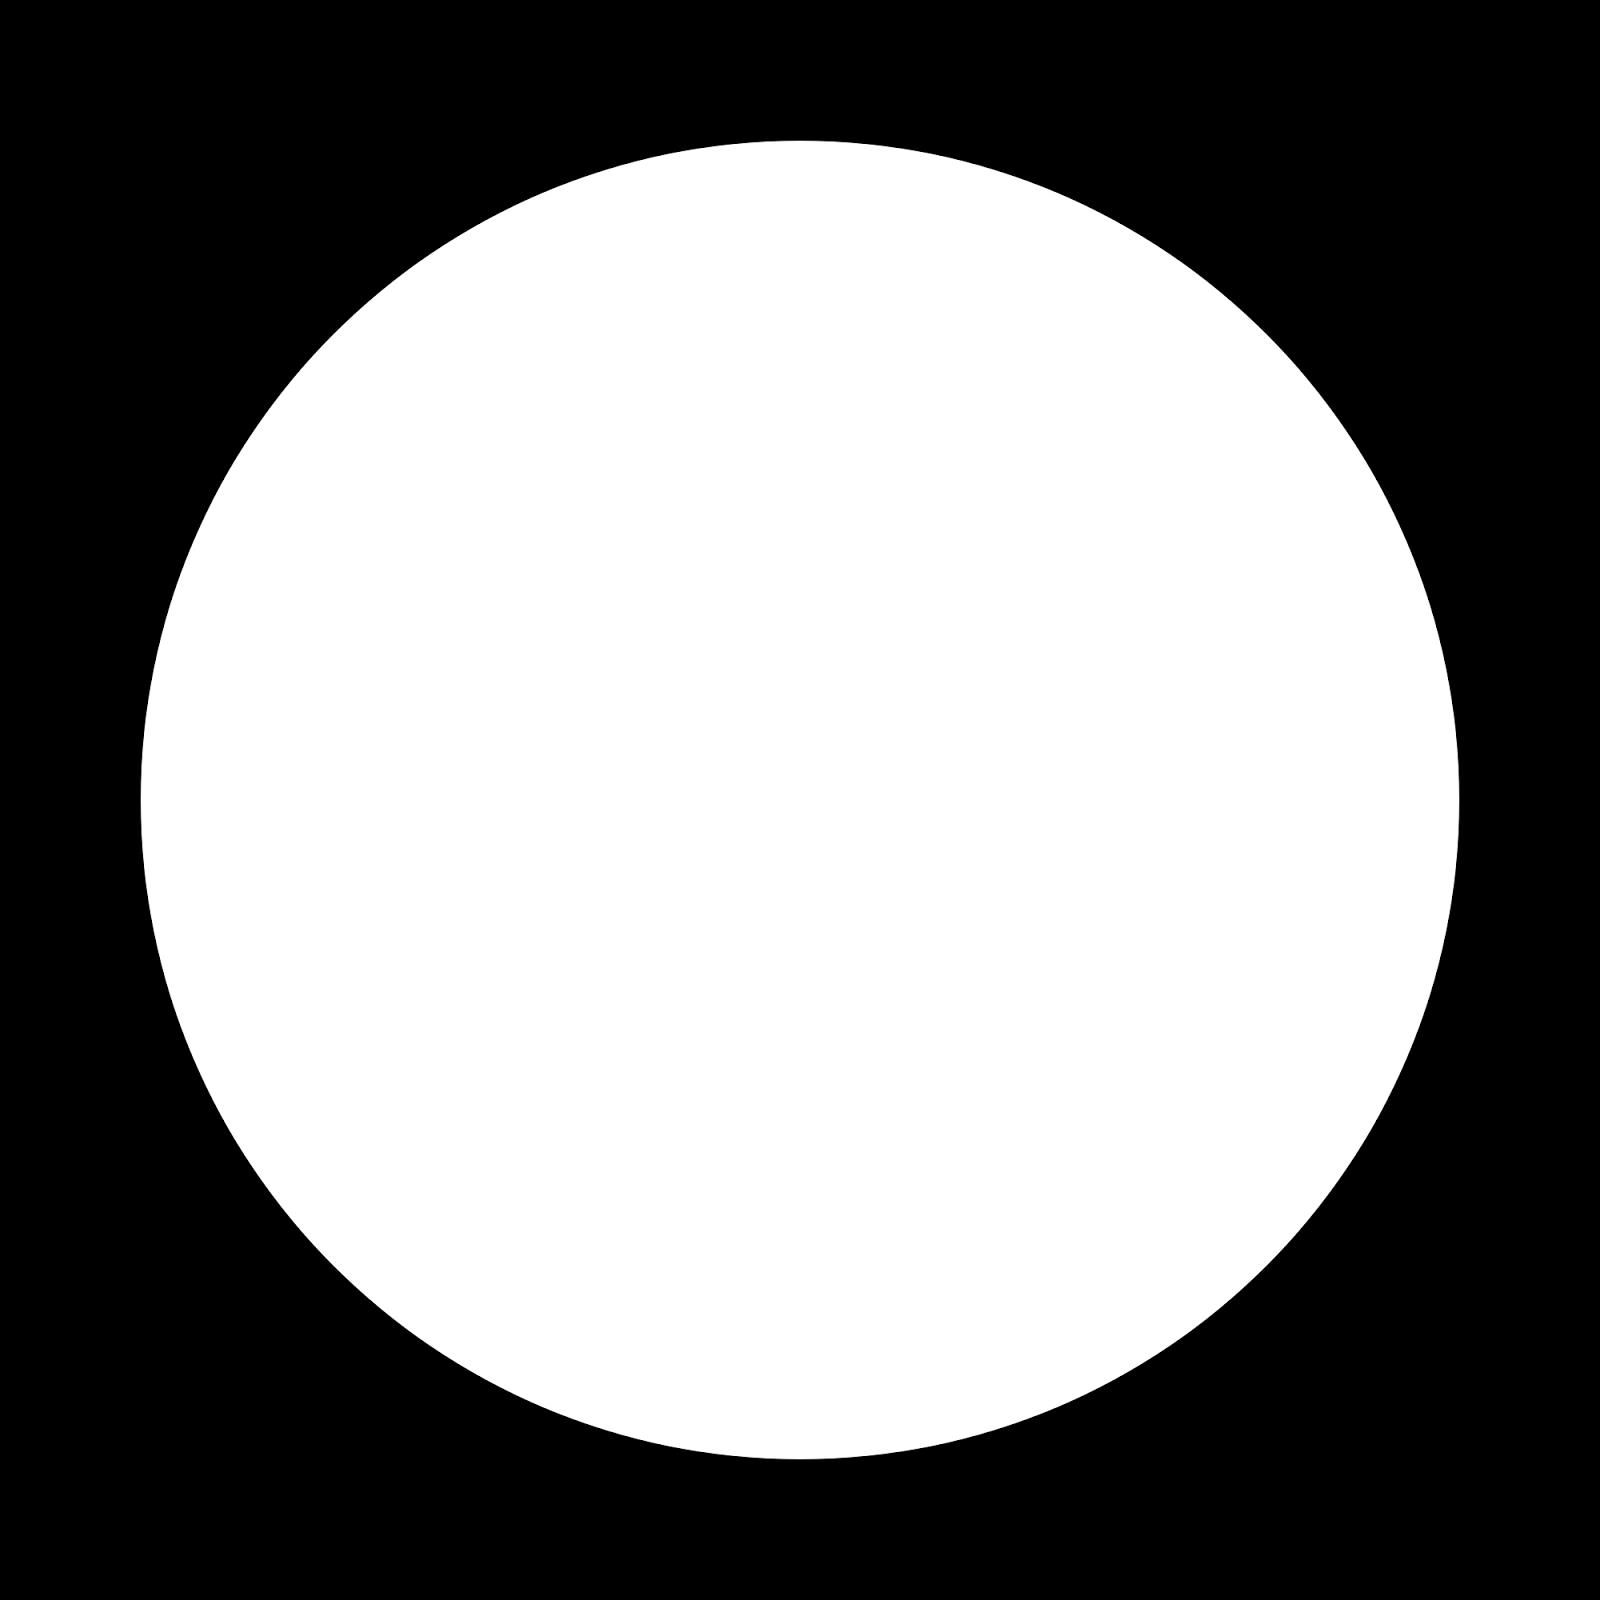 mandala atelier inspiratie workshop 8 symbolen de cirkel